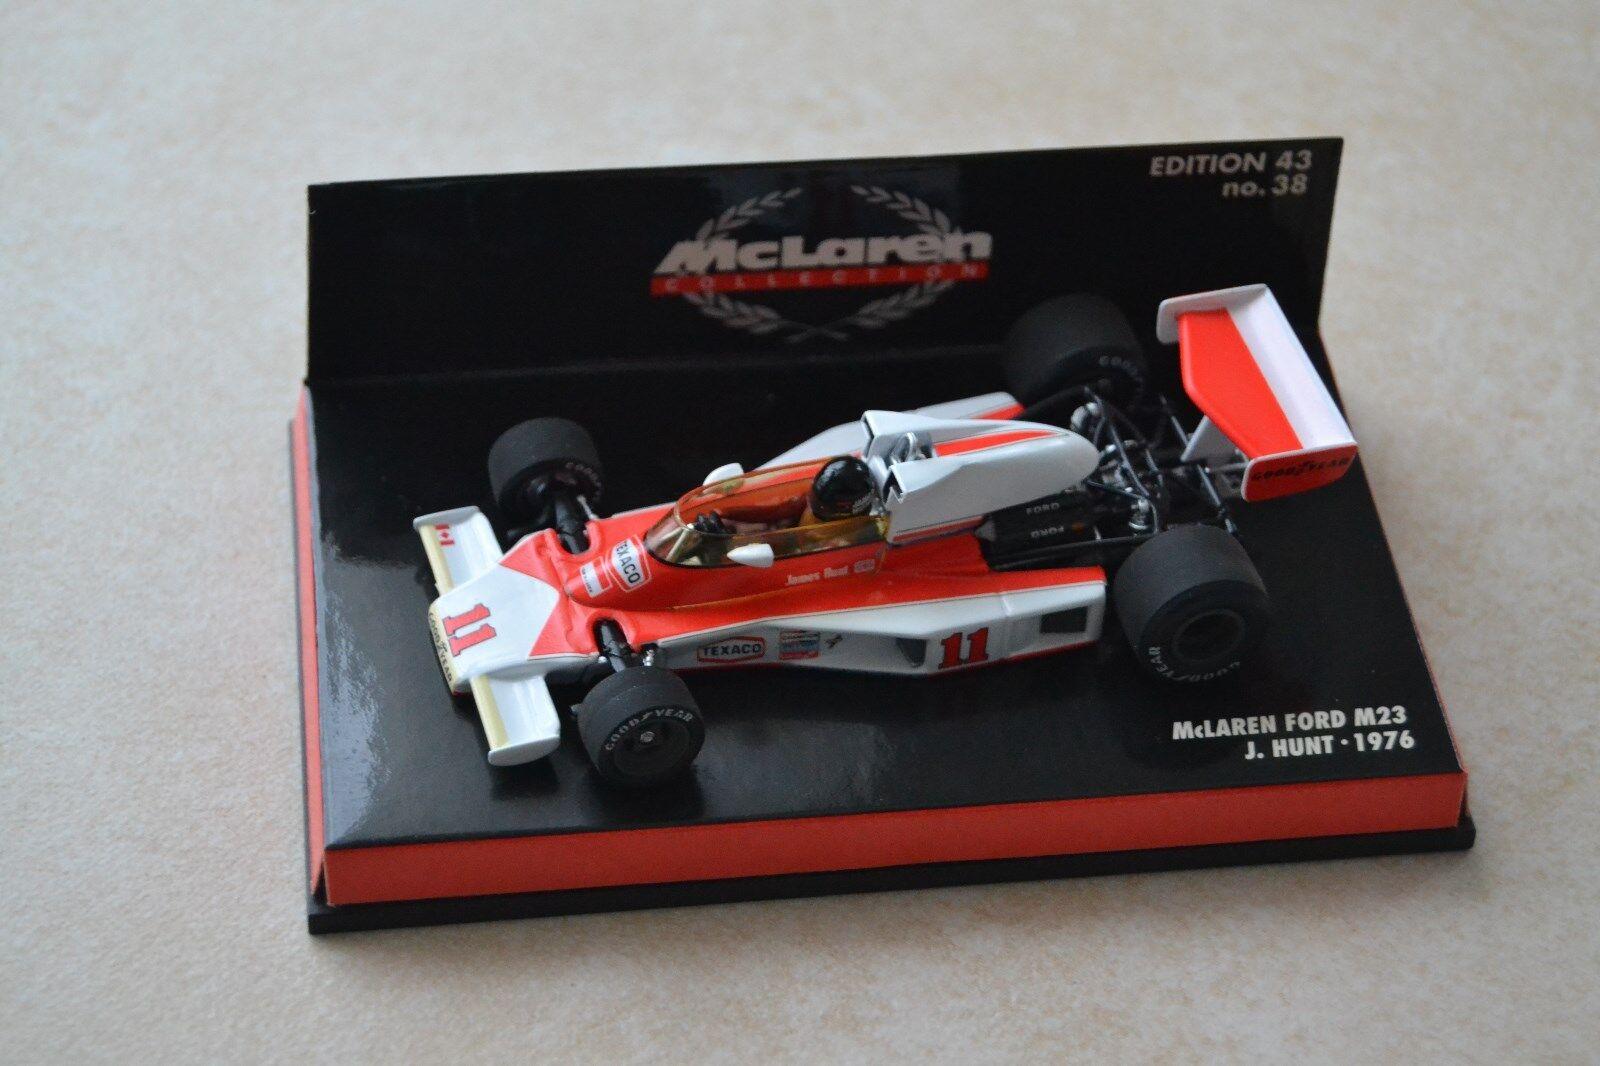 F1 McLaren Ford M23 James HUNT World Champion 1976 (1 43)